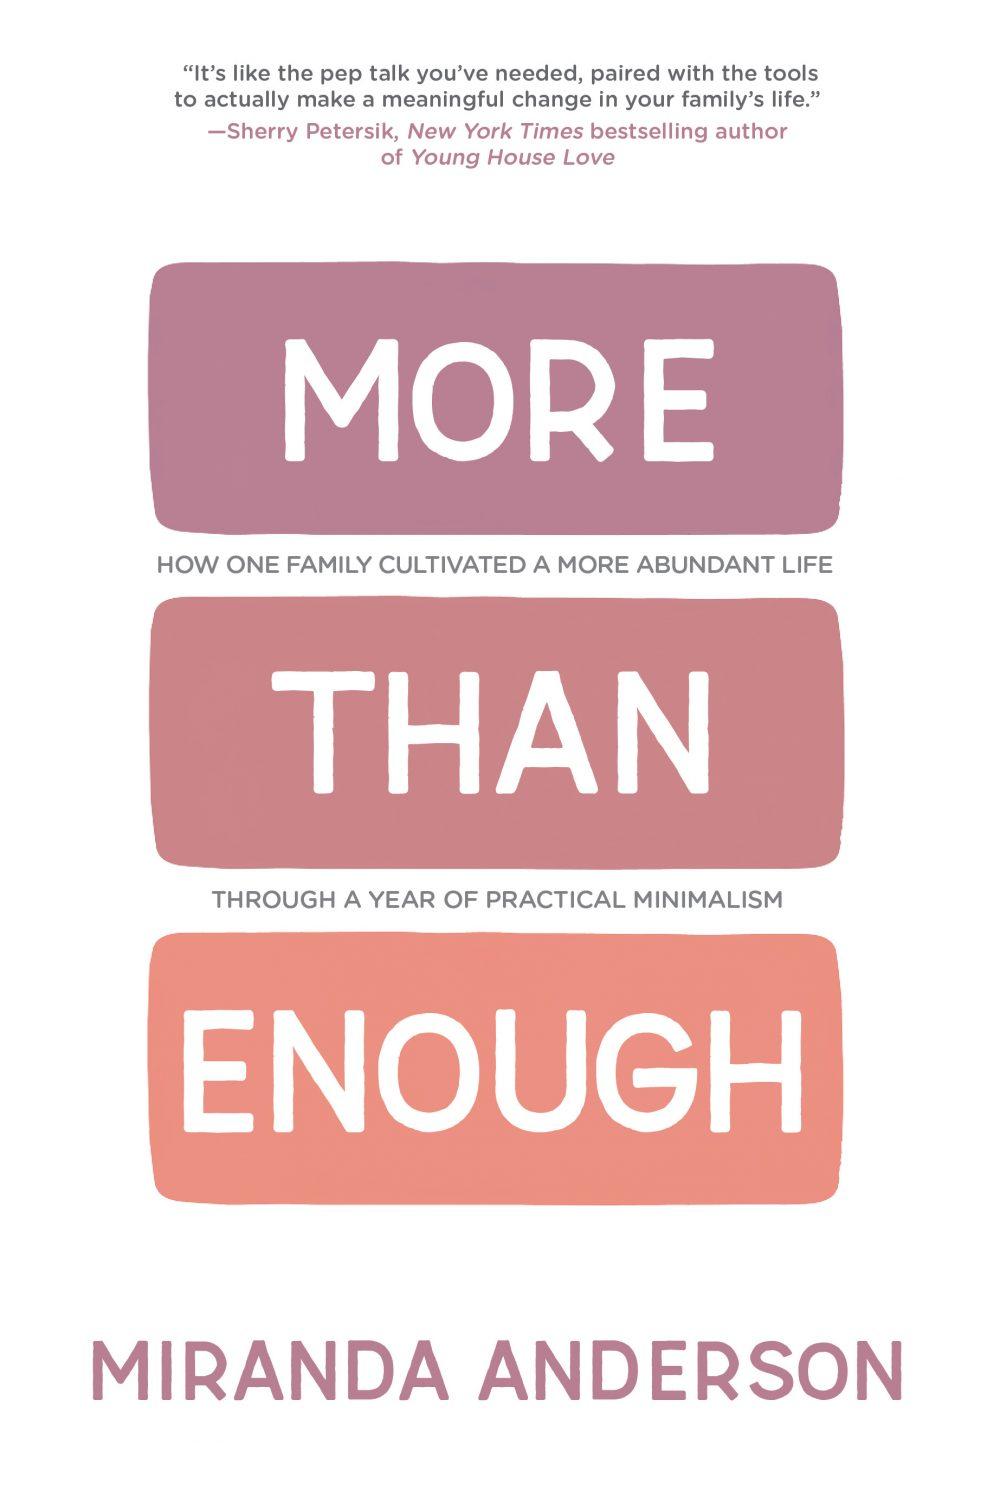 More than enough by Miranda Anderson